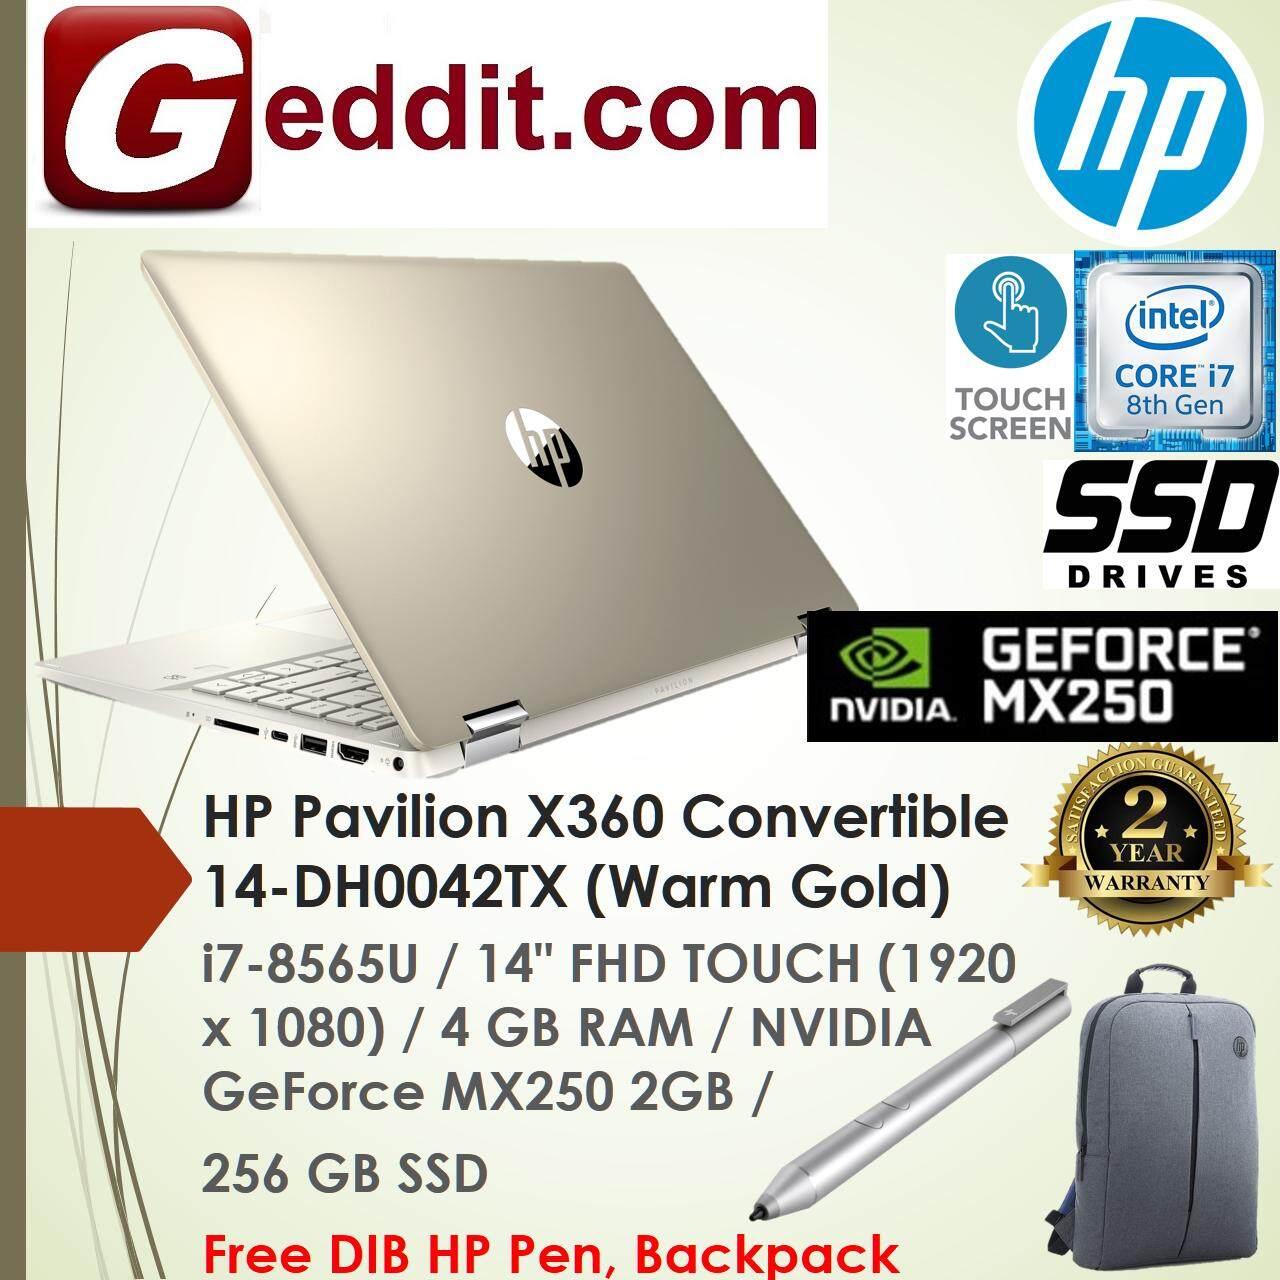 HP PAVILION X360 14-DH0042TX NOTEBOOK (i5-8565U,4GB,256GB SSD,GEFORCE MX250,14,WIN10) FREE BACKPACK Malaysia